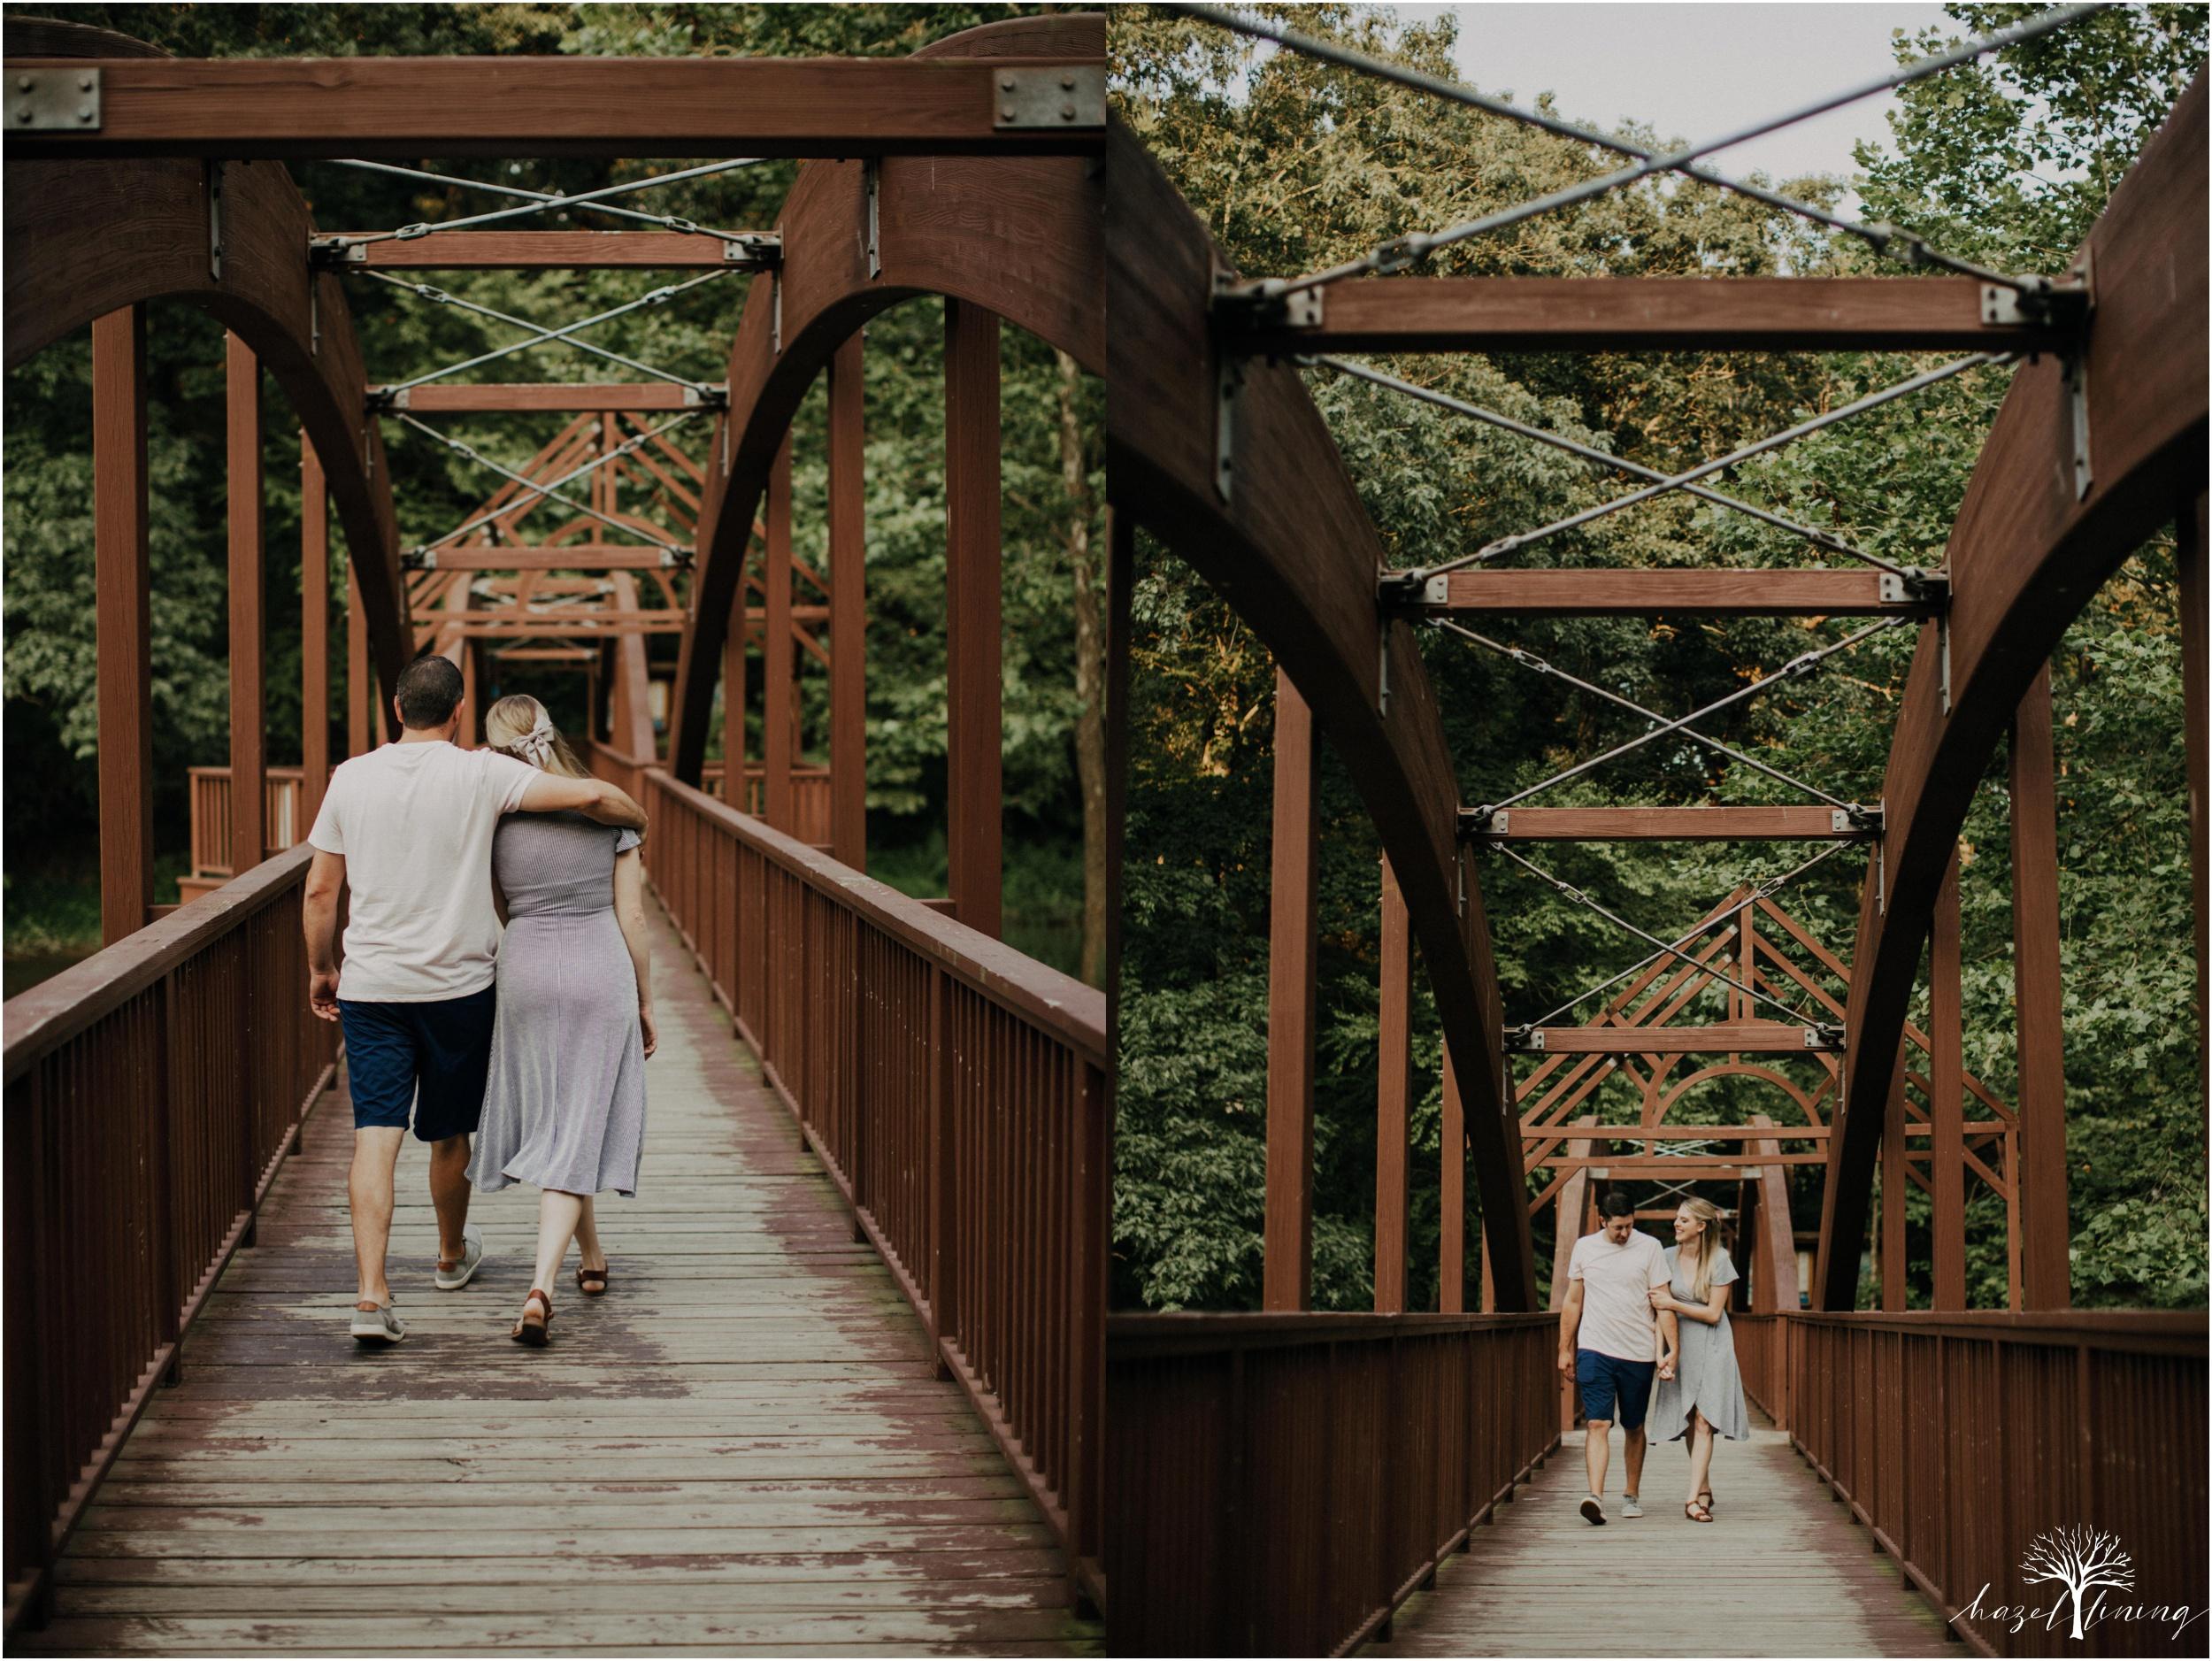 ashley-fillmore-steve-reimer-trexler-nature-preserve-summer-engagement-session-schnecksville-pennsylvania-hazel-lining-photography-destination-elopement-wedding-engagement-photography_0013.jpg